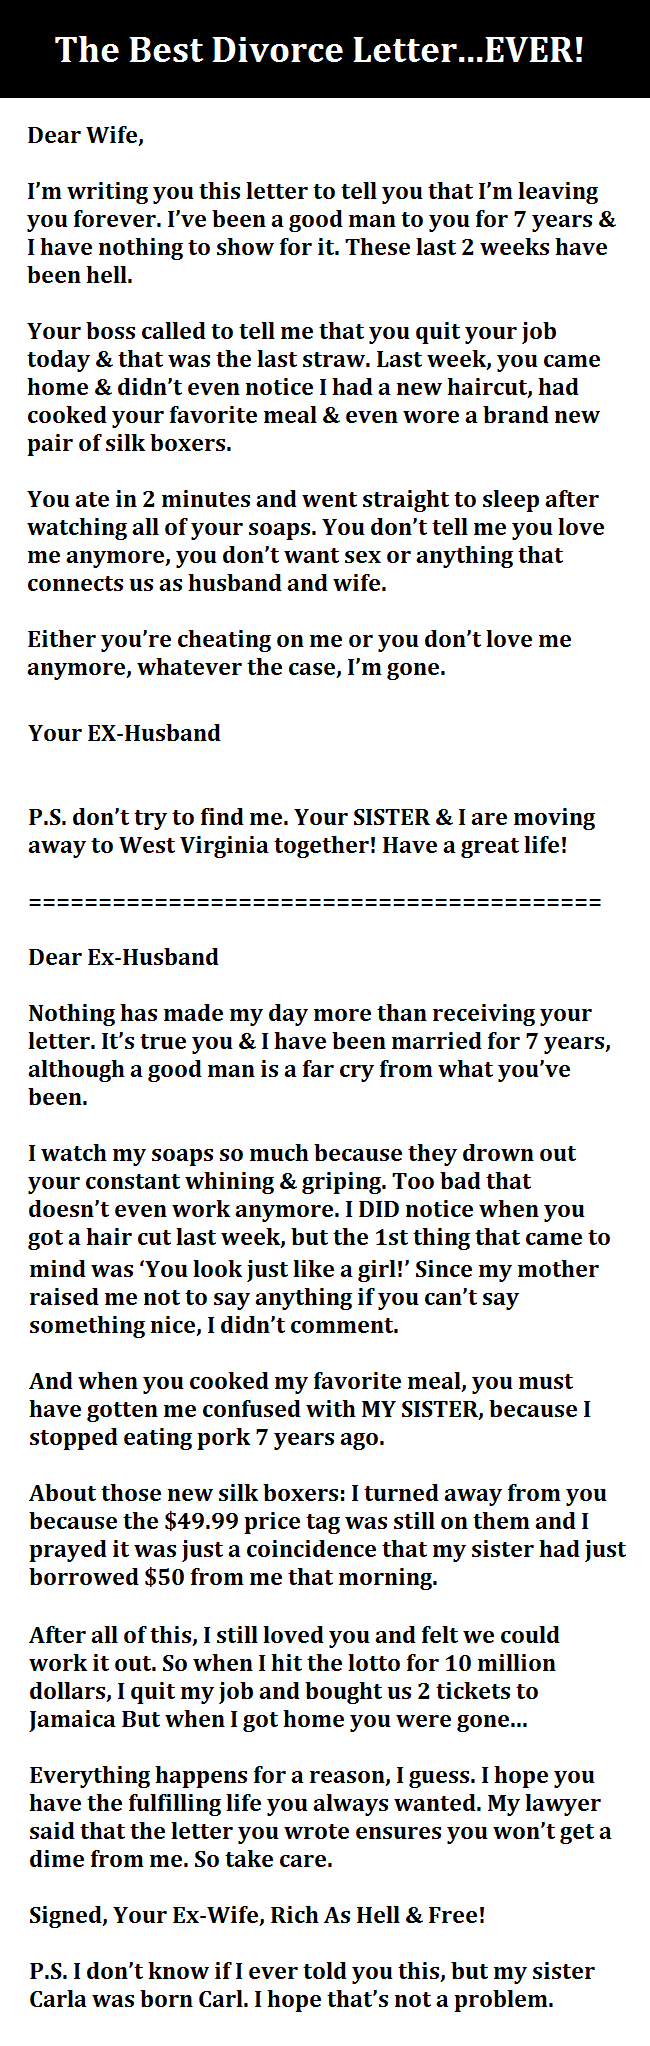 gg dest  divorse letter